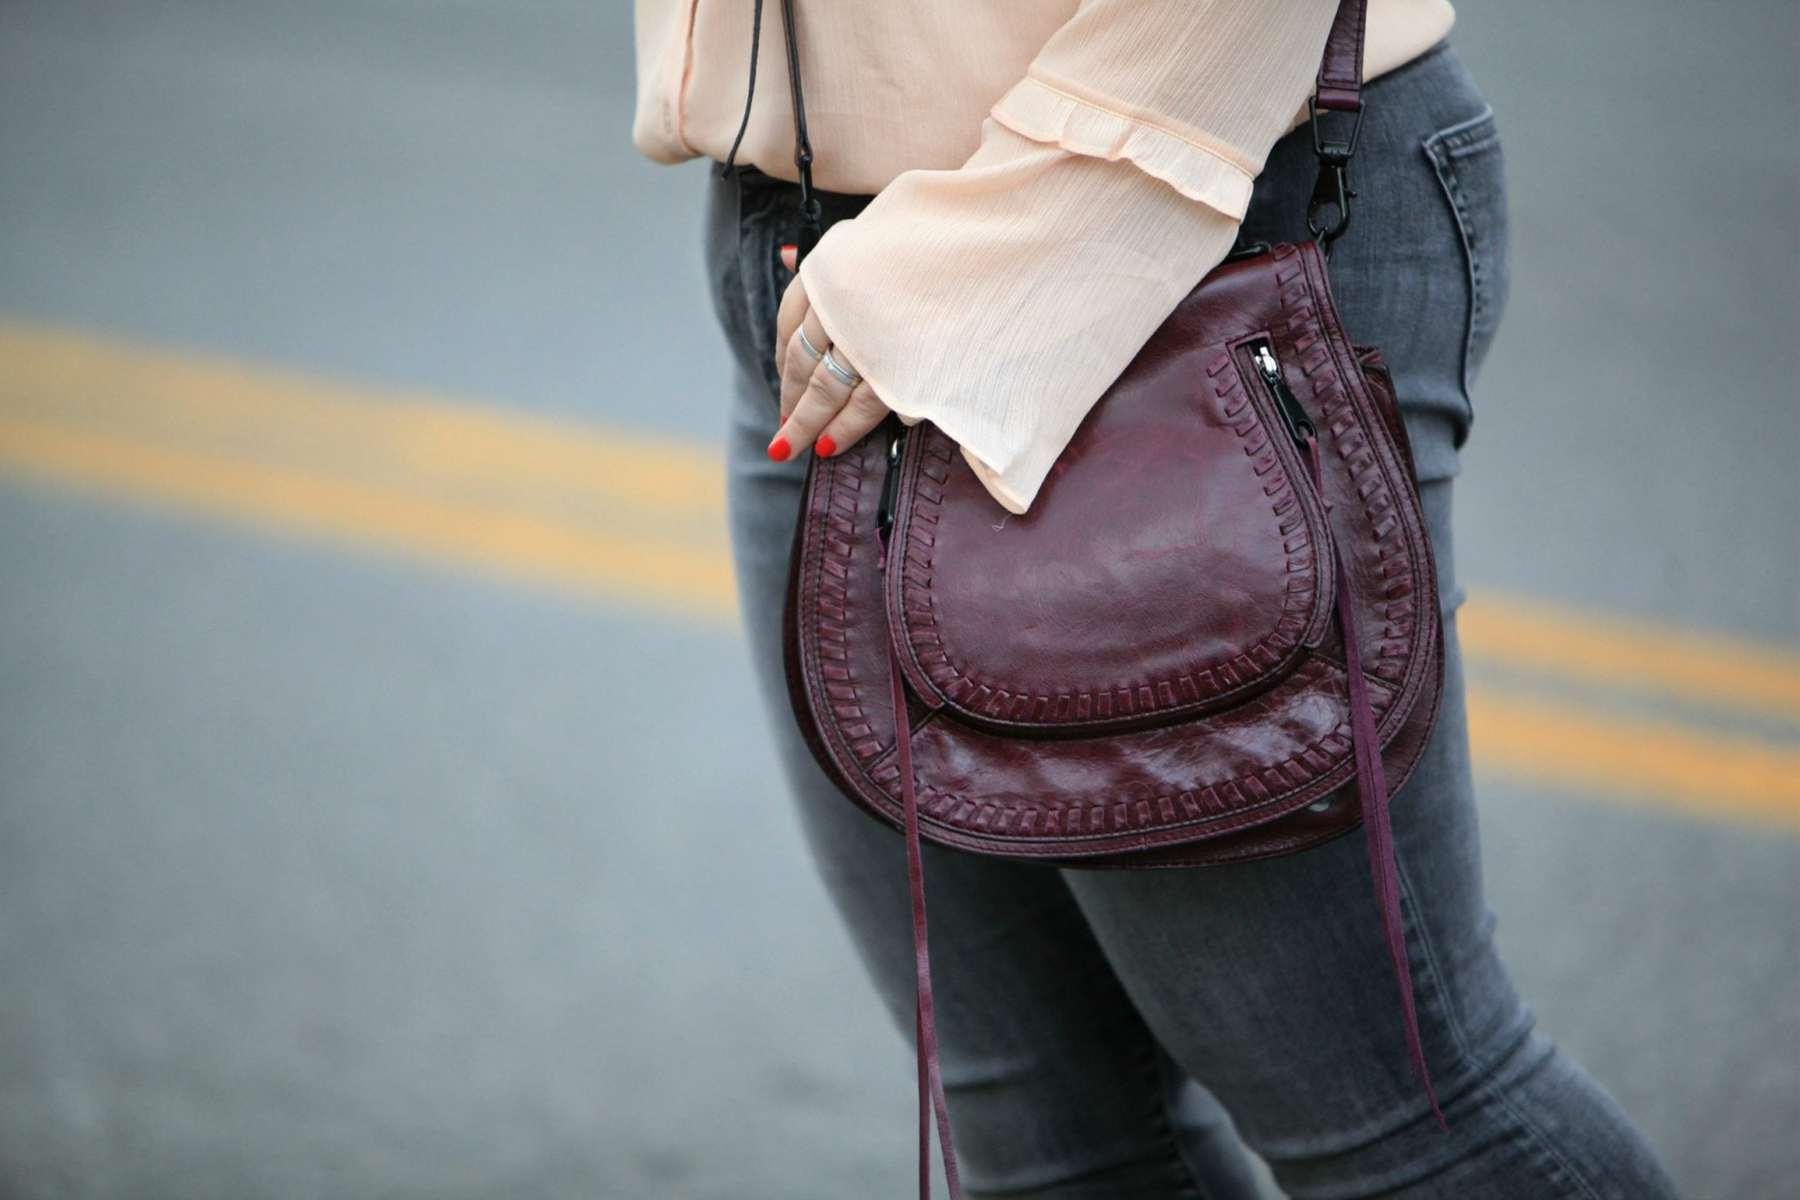 Wardrobe Oxygen with the Rebecca Minkoff Vanity bag in Oxblood